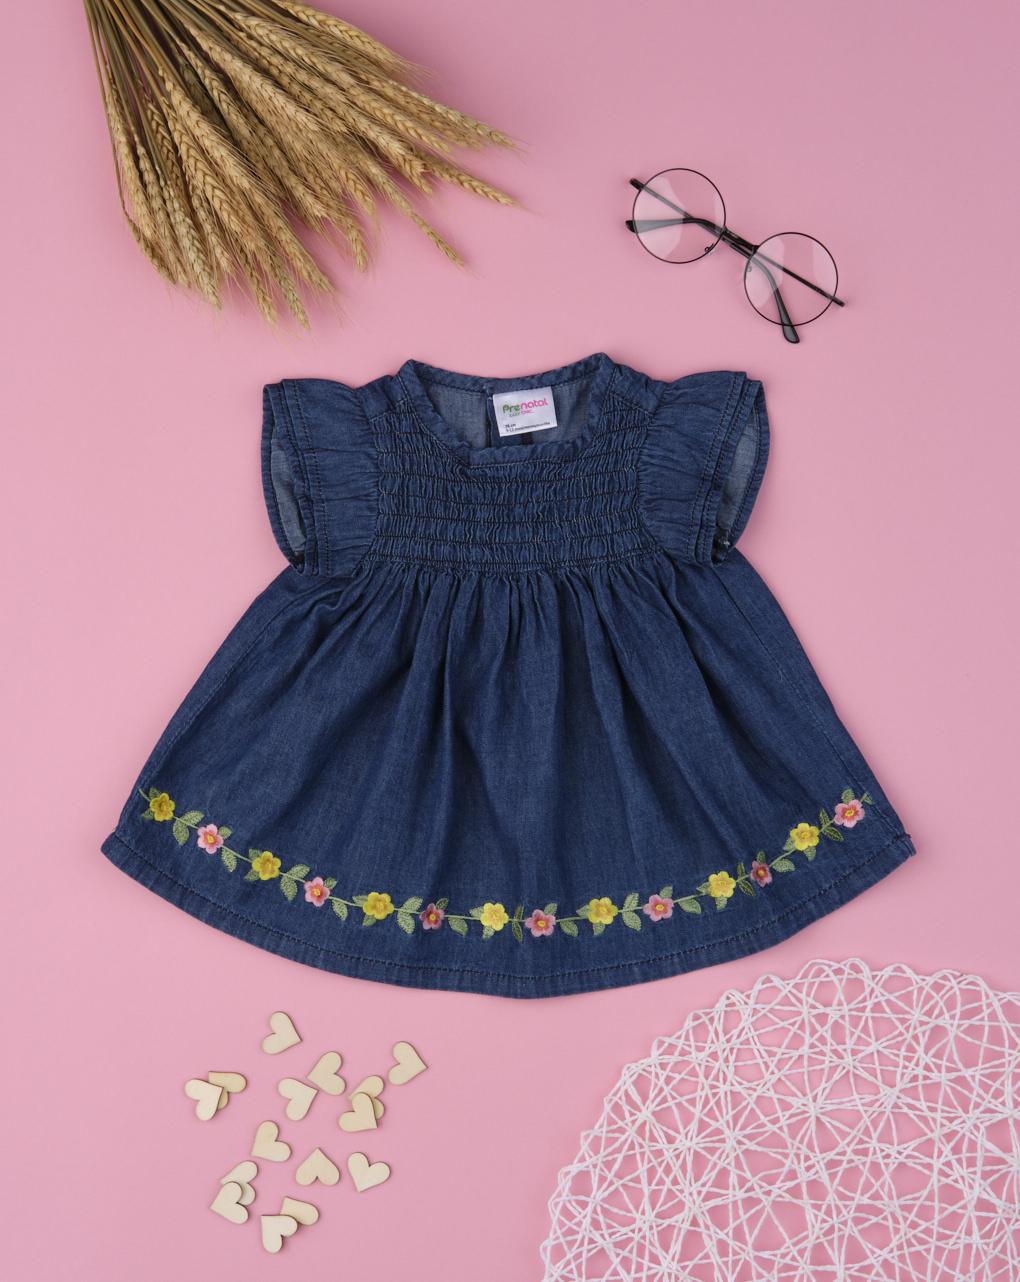 Camisa de menina chambray com flores - Prénatal